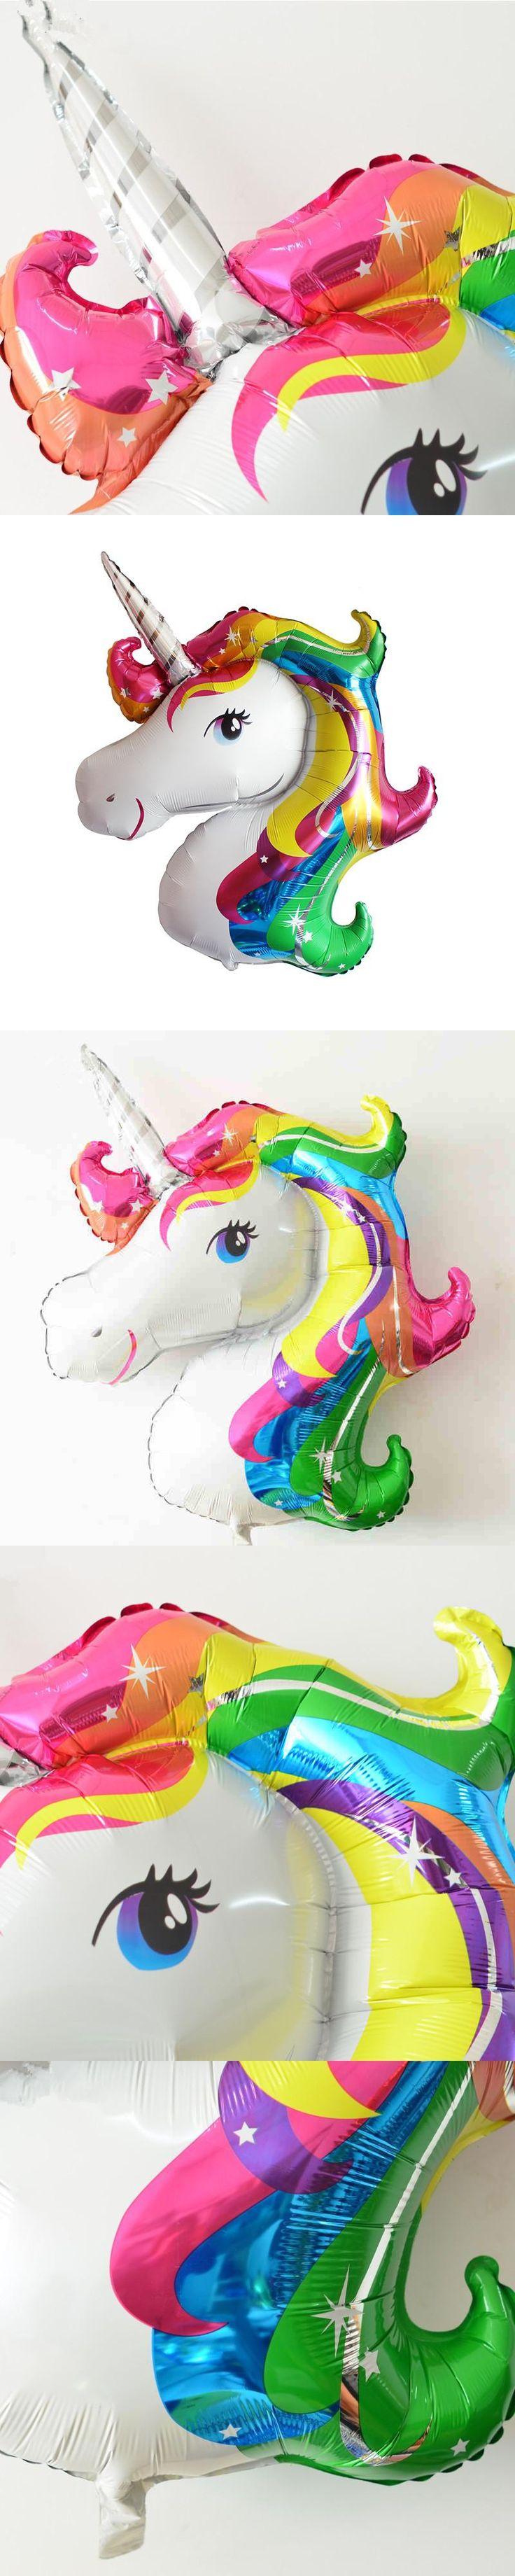 1pc 125x88cm Aluminium Foil Unicorn Shape Balloons Inflatable Classic Toys Birthday Party Decoration Unicorn Party Supplies